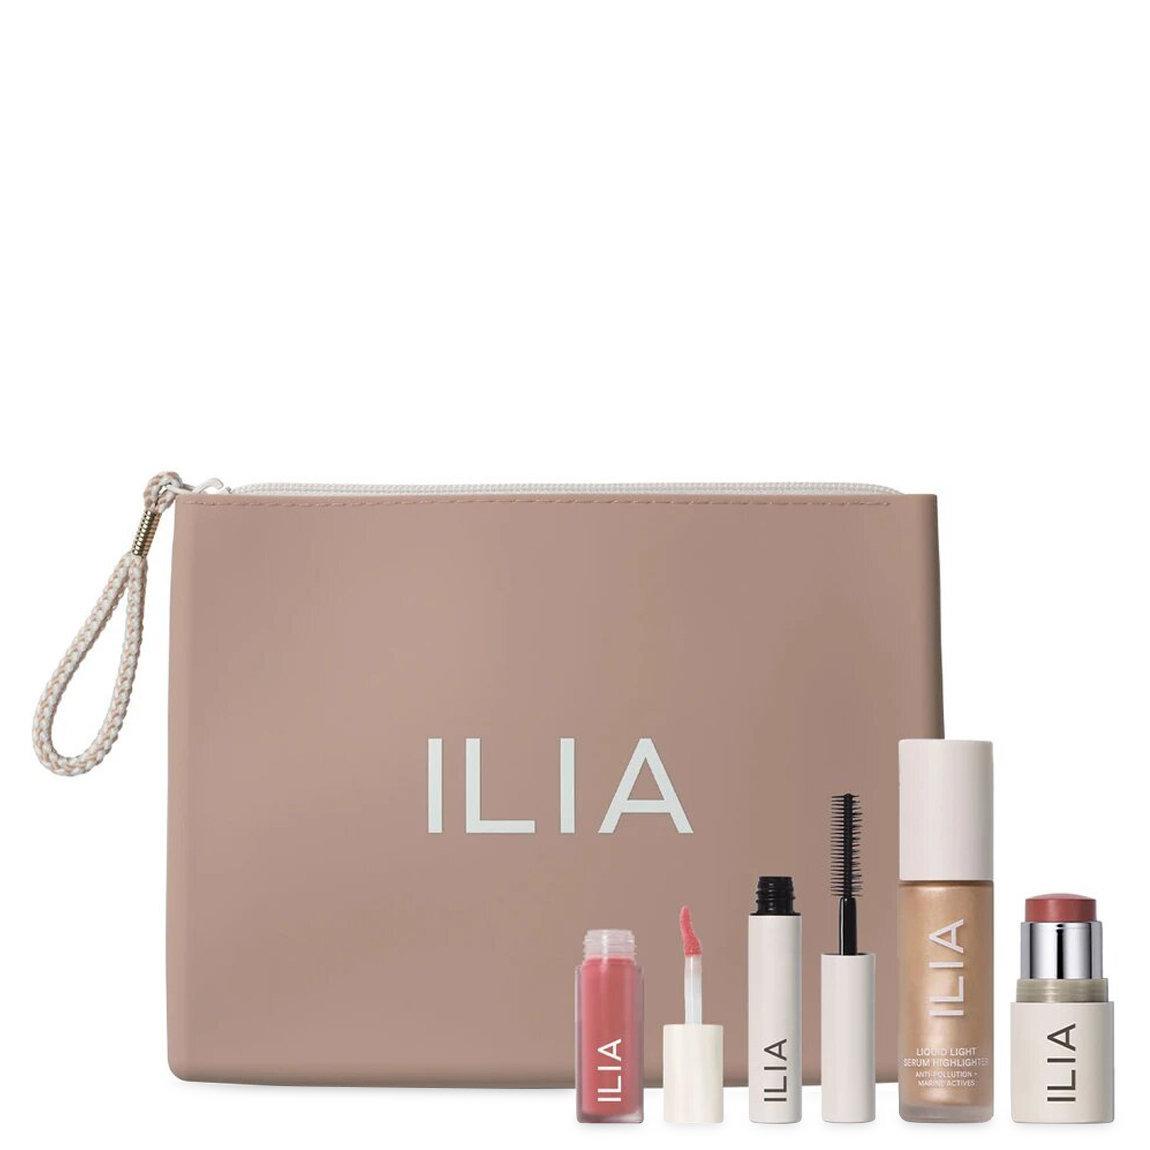 ILIA Hello, Clean Makeup Set product swatch.